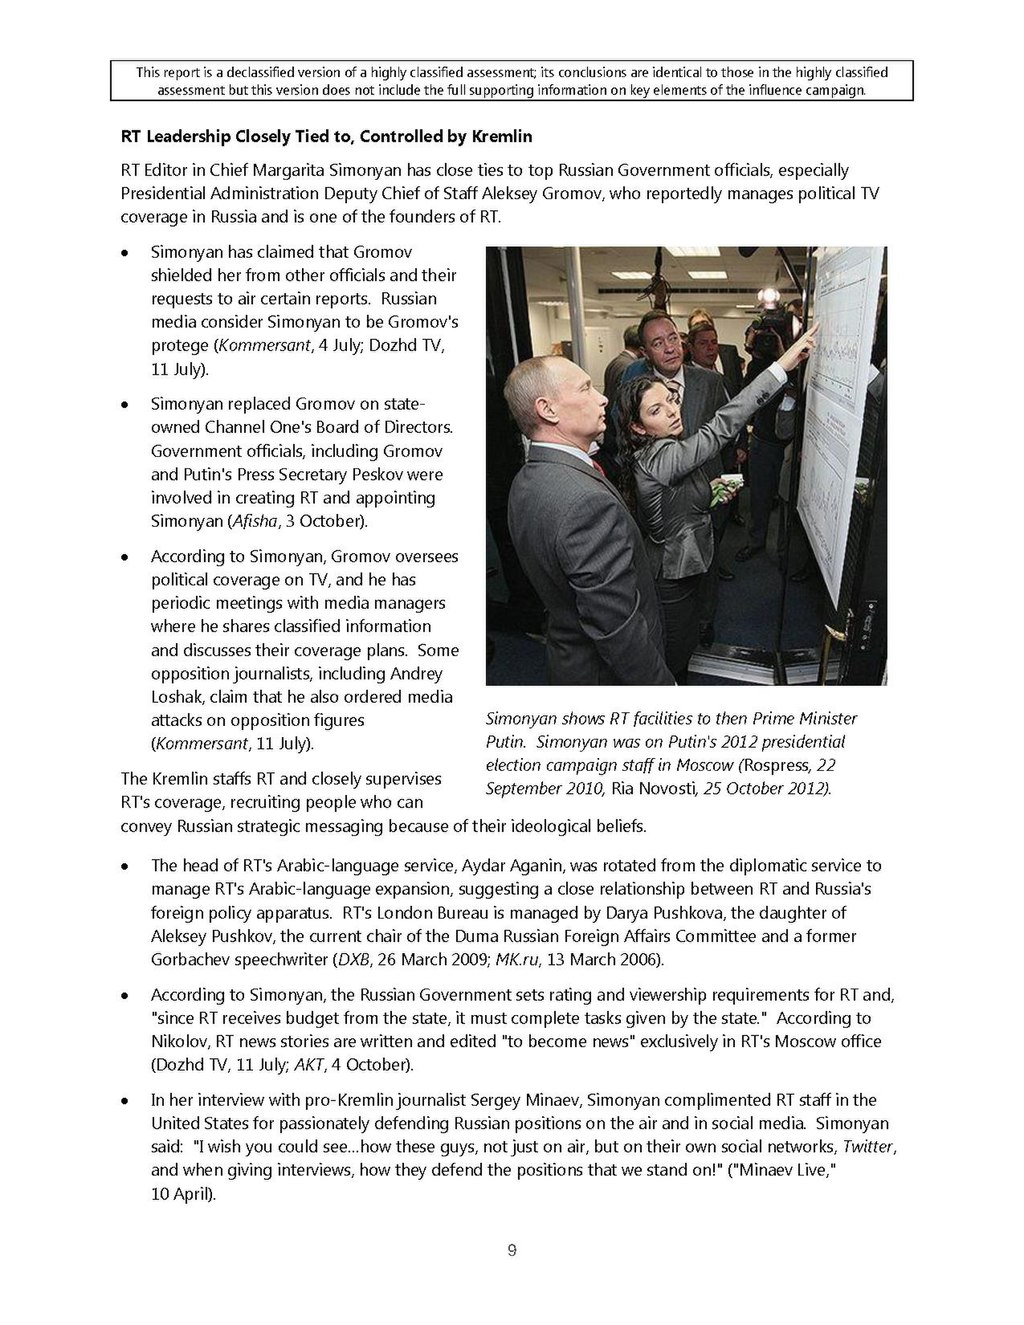 Pageintelligence Community Assessment Assessing Russian